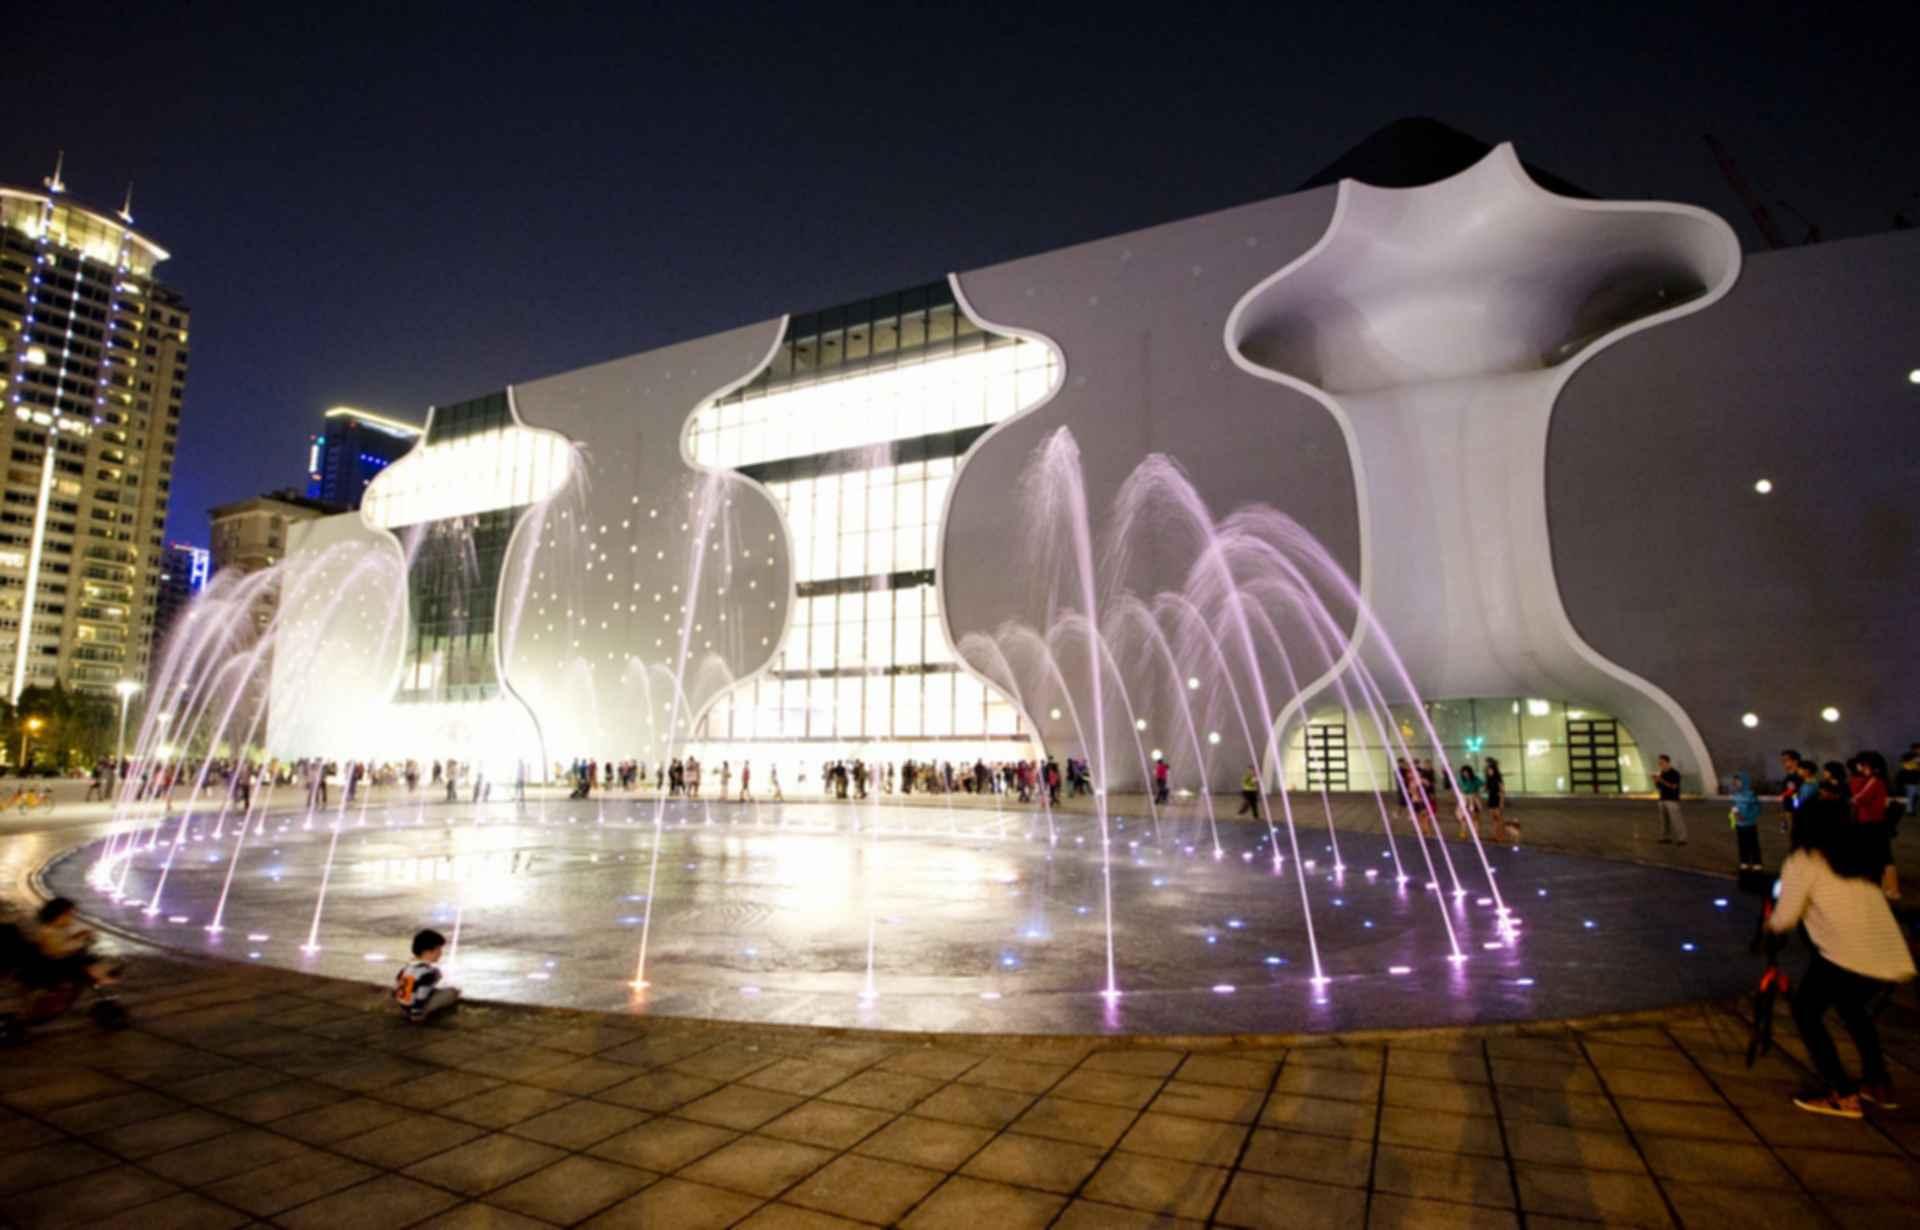 Taichung Metropolitan Opera House - Exterior at Night